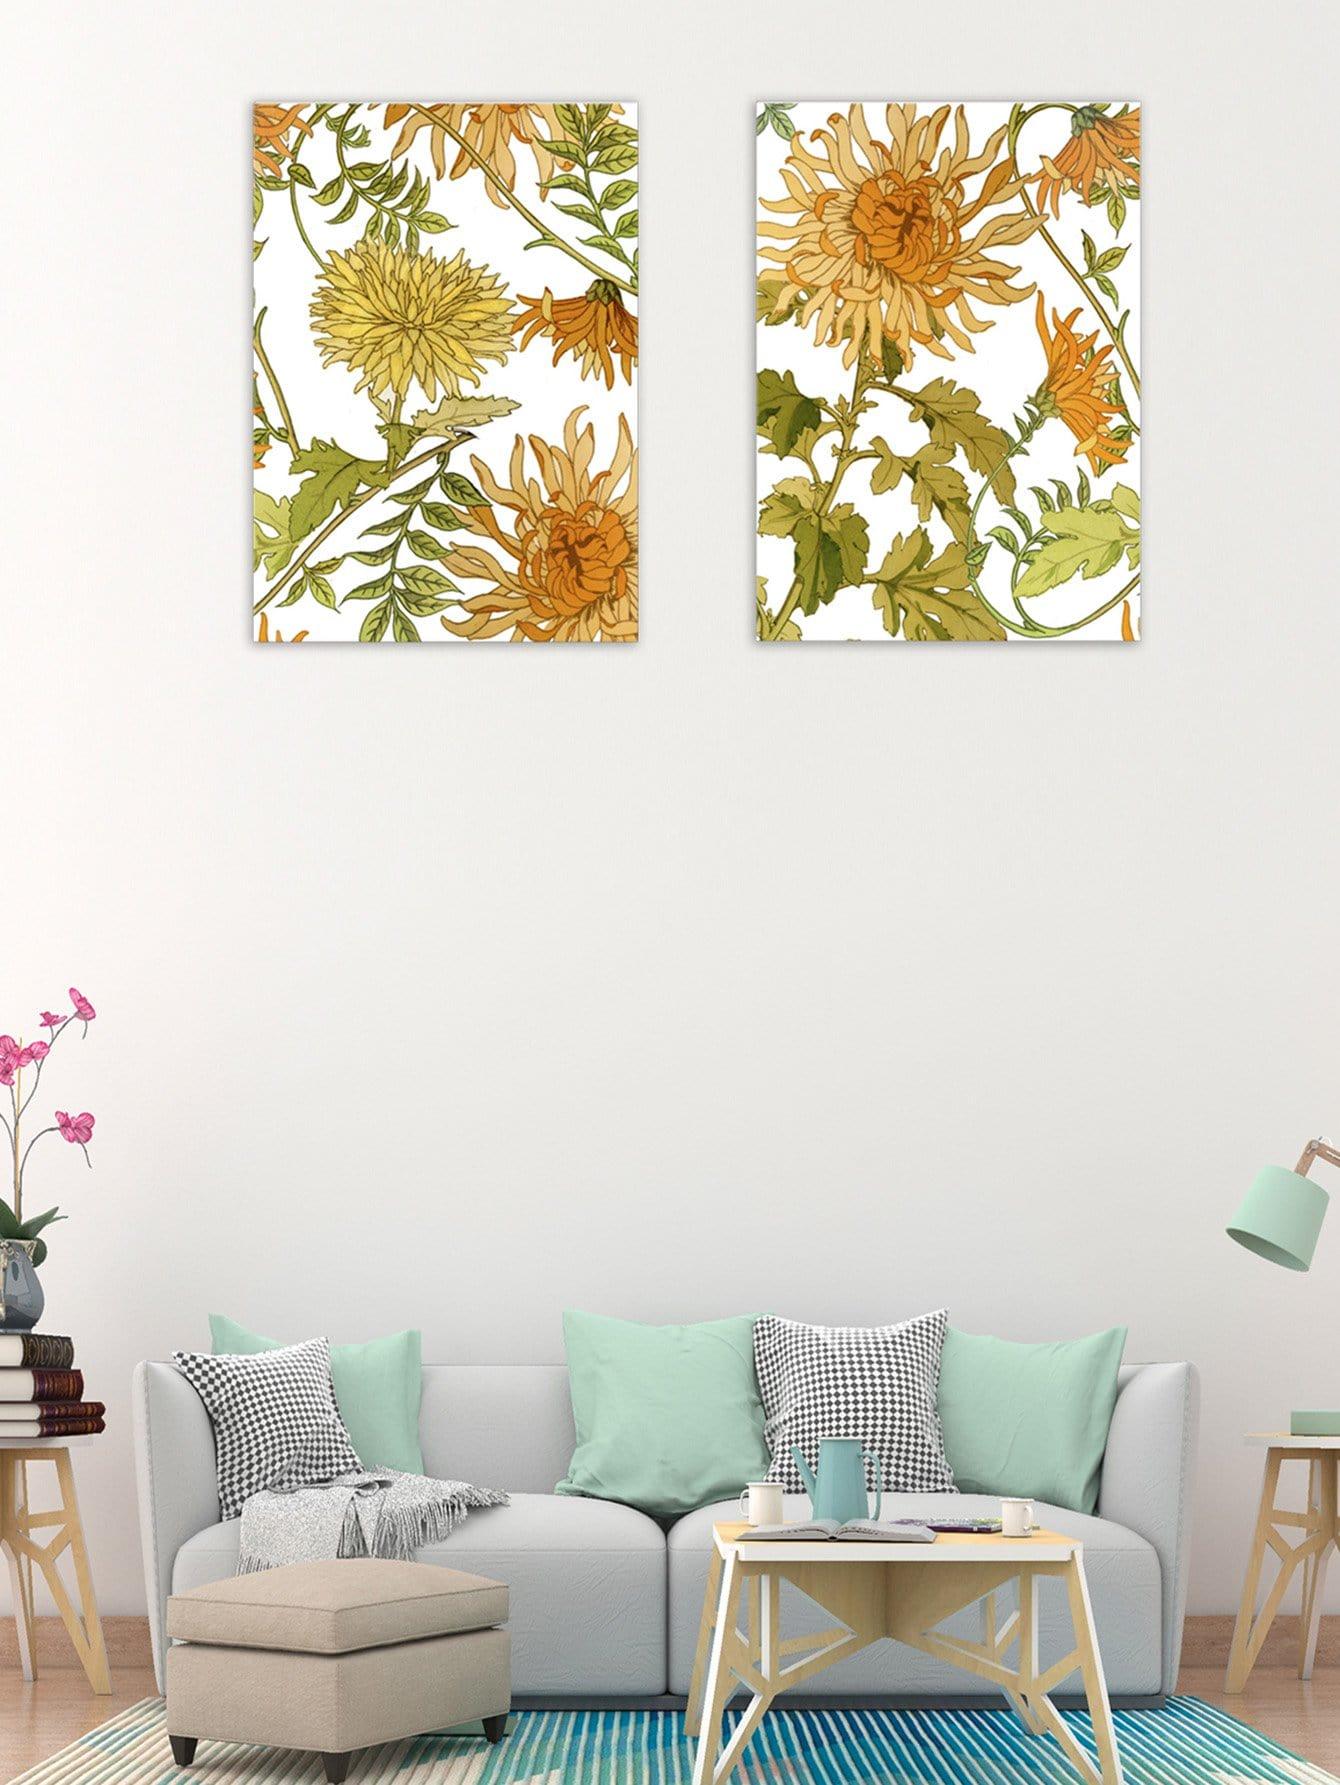 Chrysanthemum Cloth Wall Art 2pcs bear pattern cloth wall art 2pcs